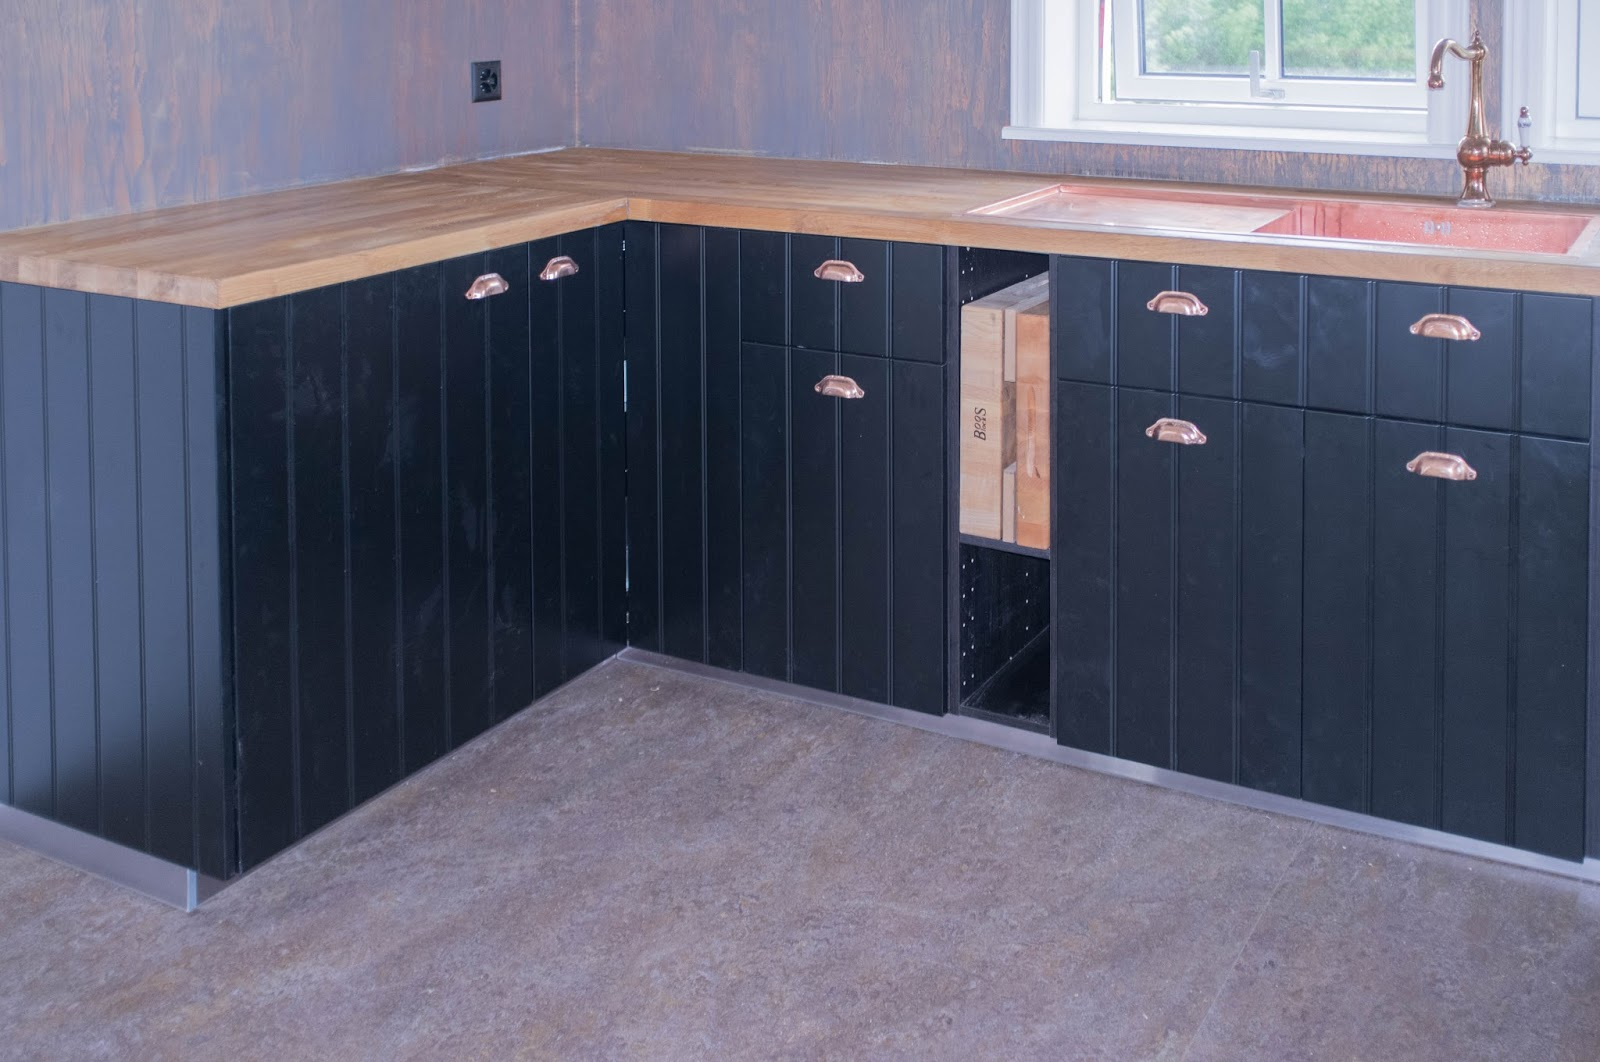 valmue pimp my ikea tag 4. Black Bedroom Furniture Sets. Home Design Ideas